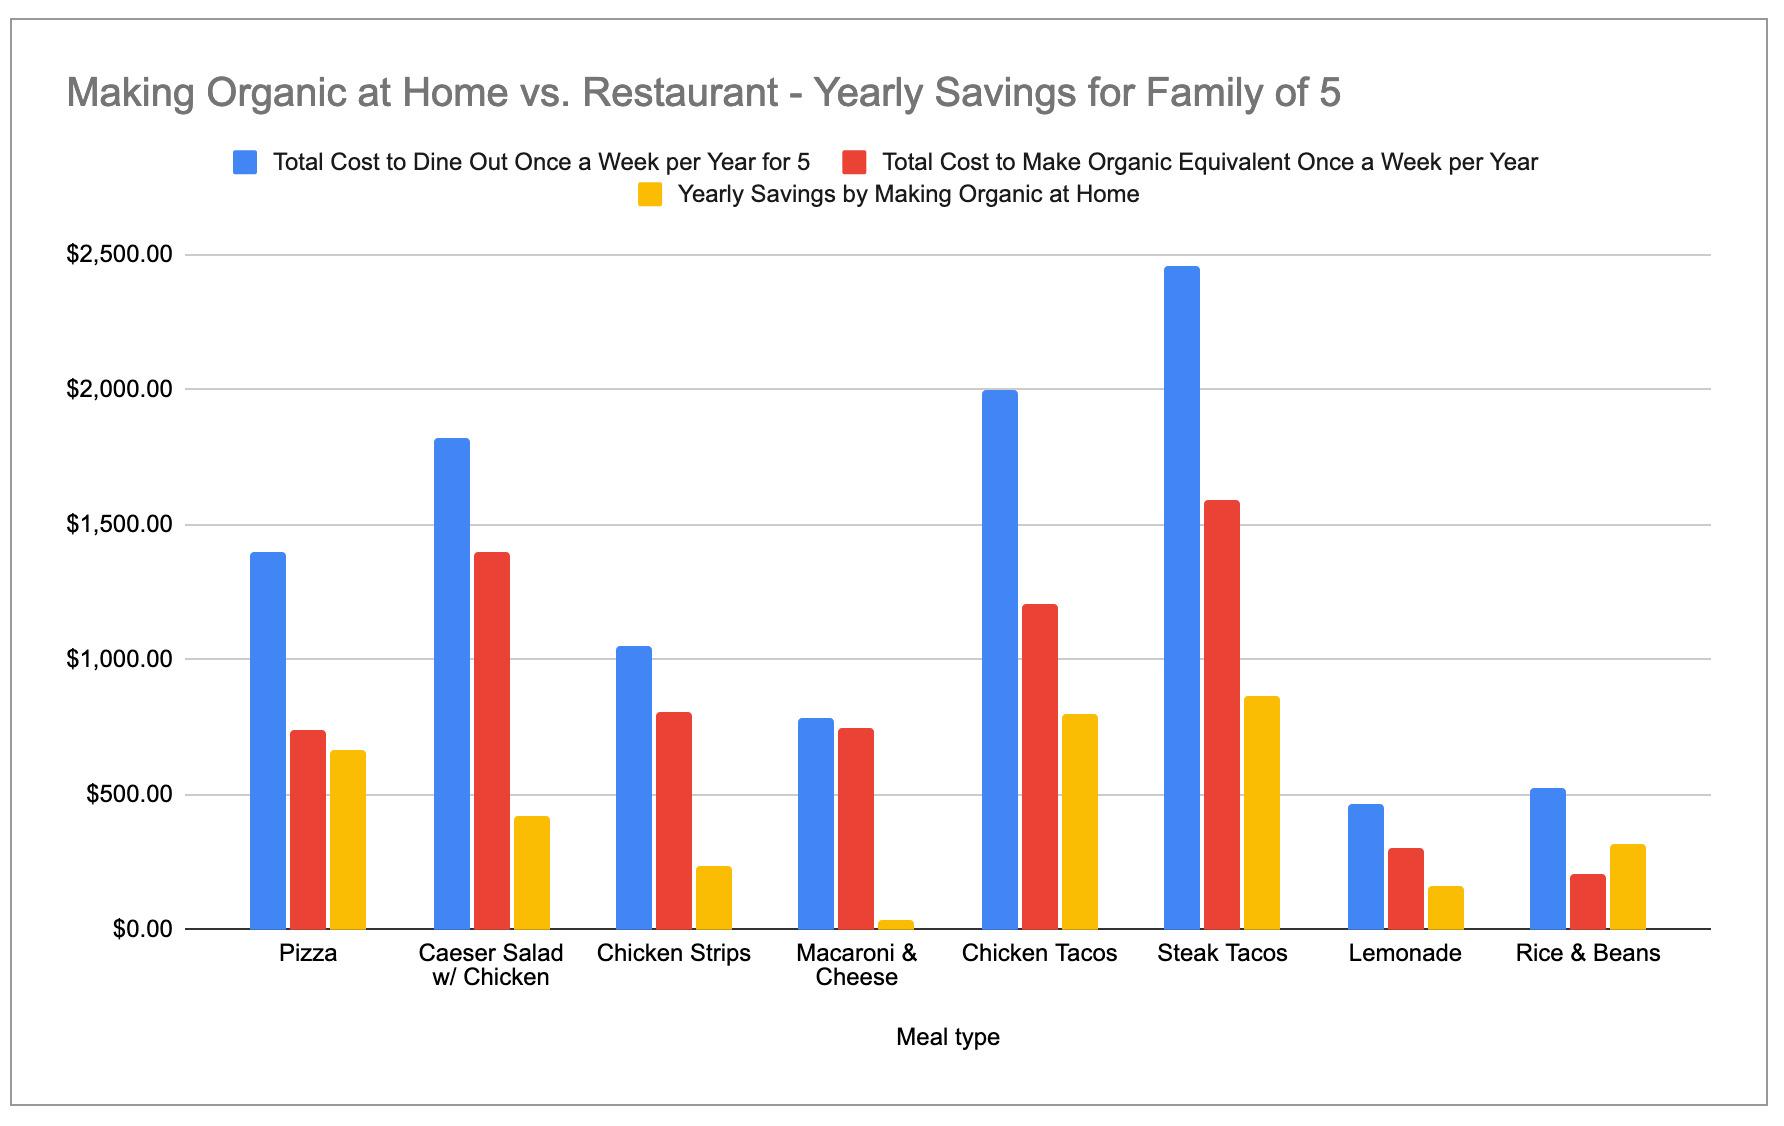 Organic_Homecooked_vs_Conventional_Restaurant_Food_-_Familyof5.jpg